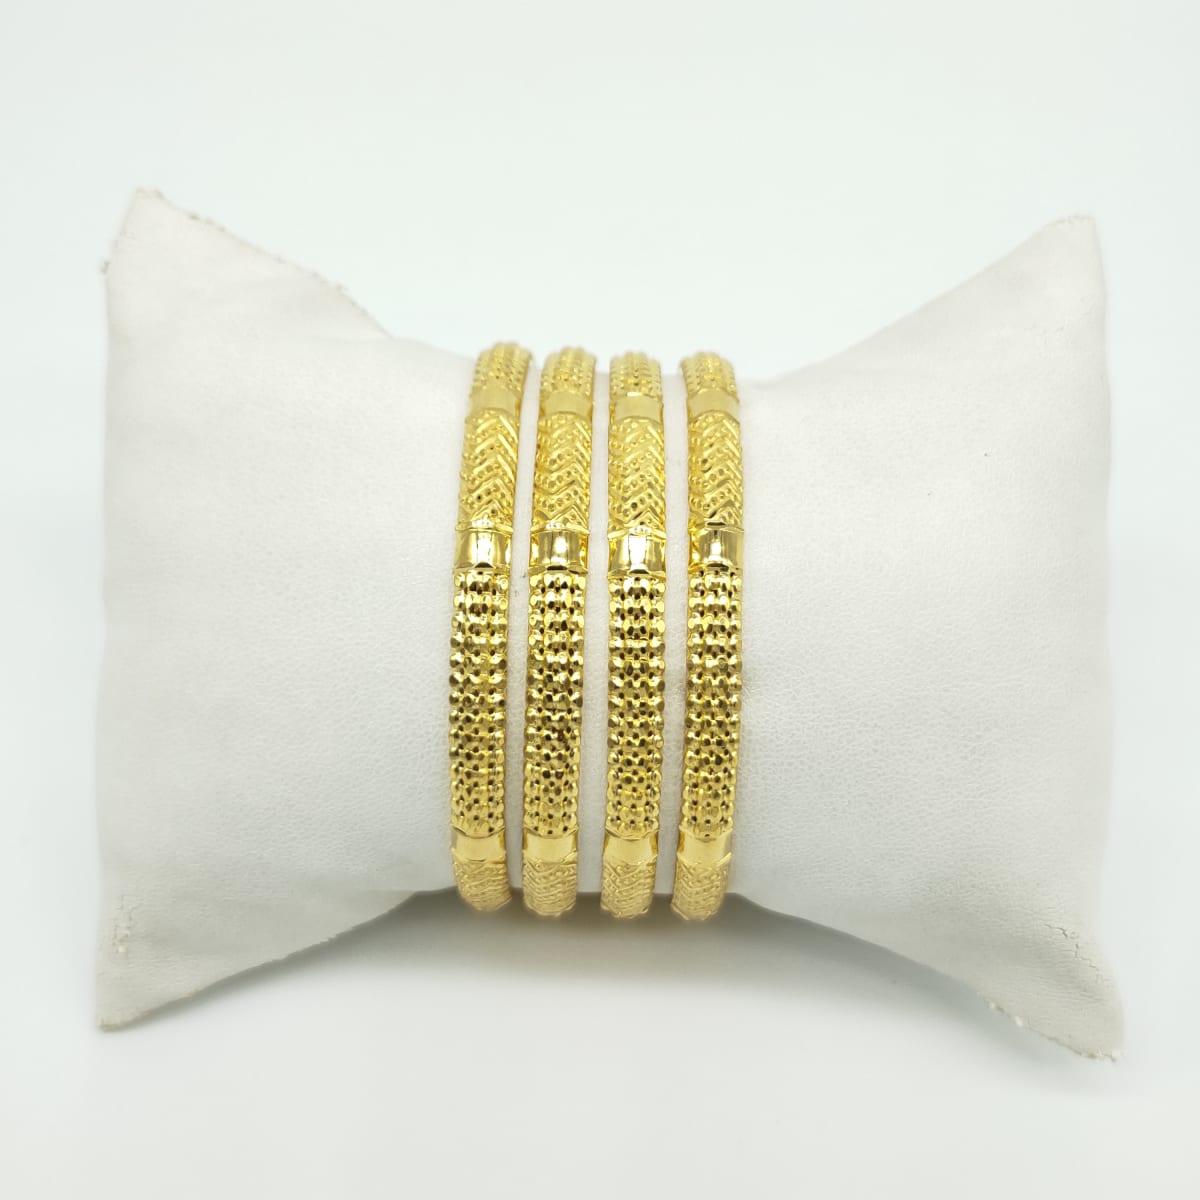 Gold Bangles Simple Design  - 4pcs